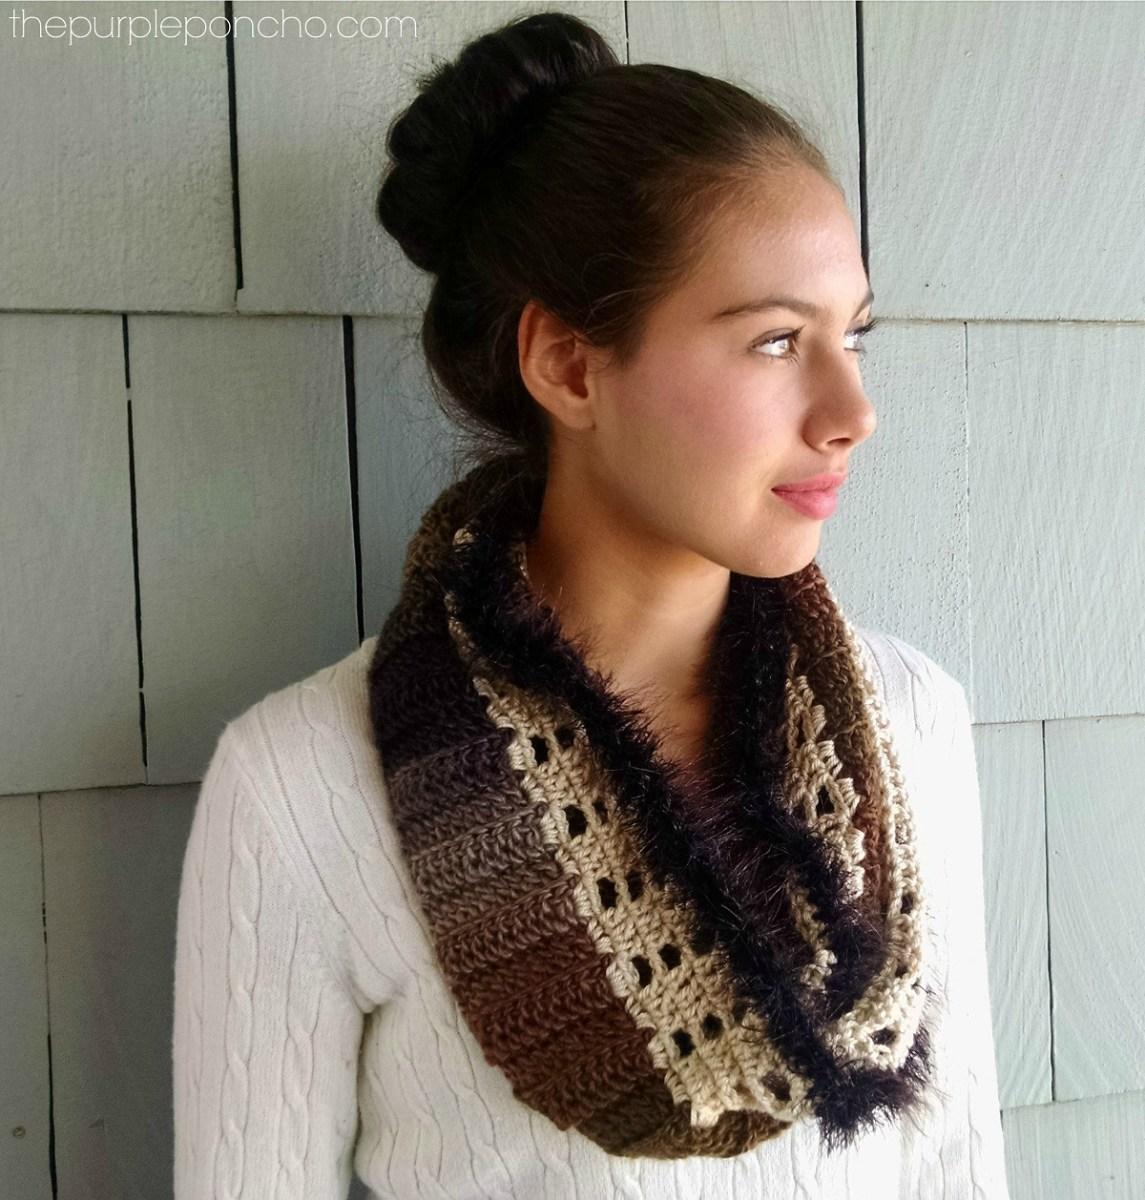 Herringbone Infinity Scarf A Free Crochet Pattern – The Purple Poncho